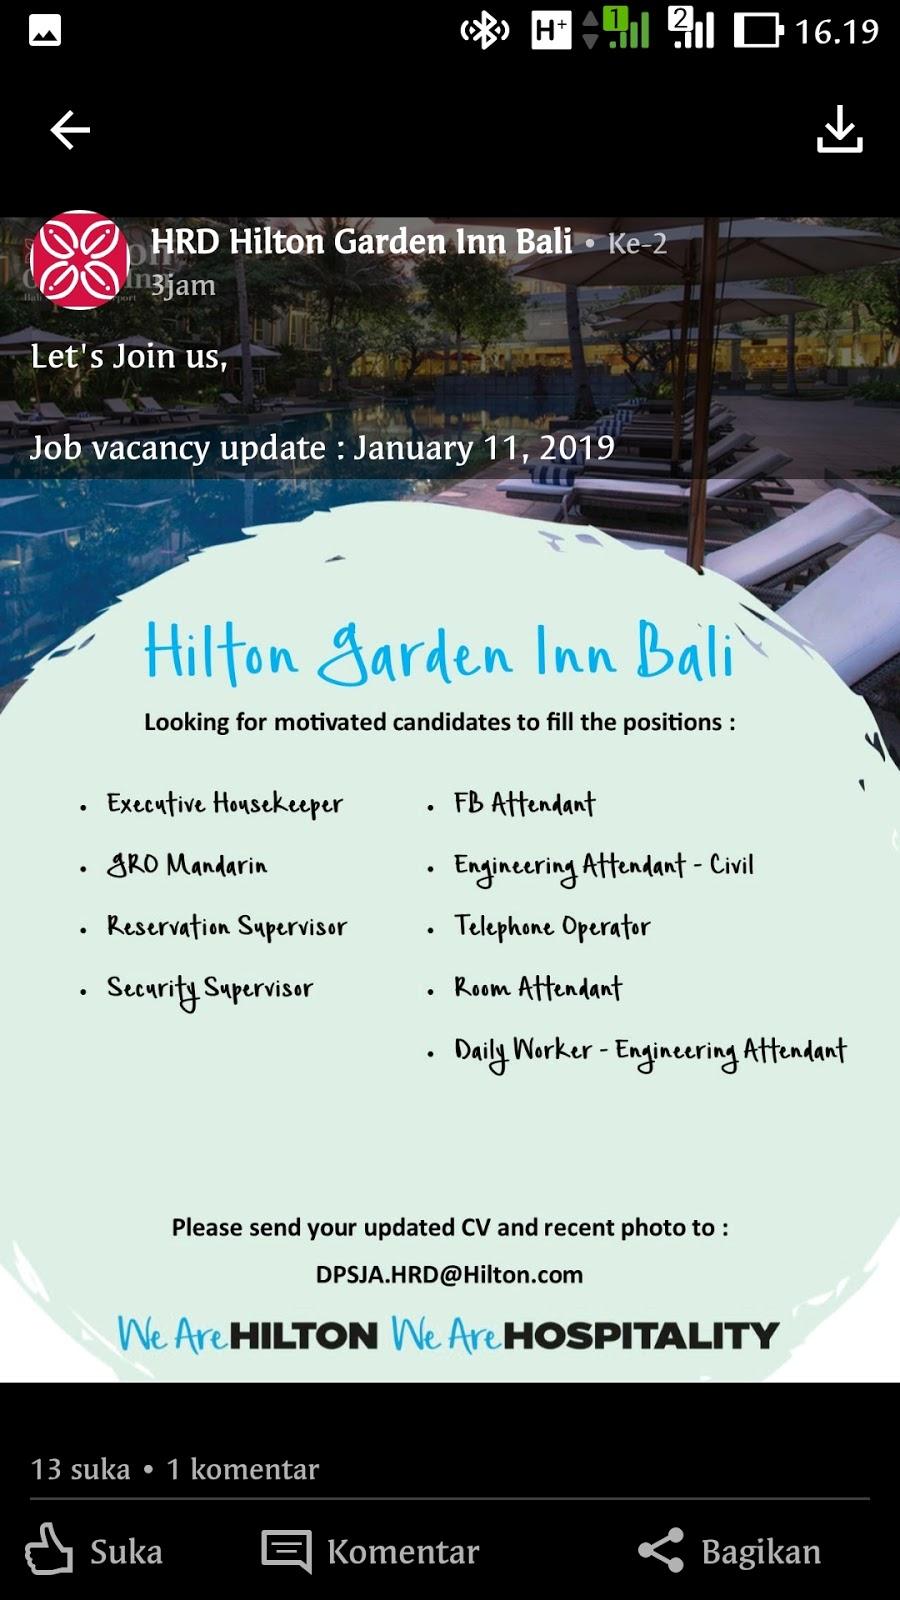 Lowongan Kerja Hilton Garden Inn Bali 9 Posisi Lowongan Kerja Hotel